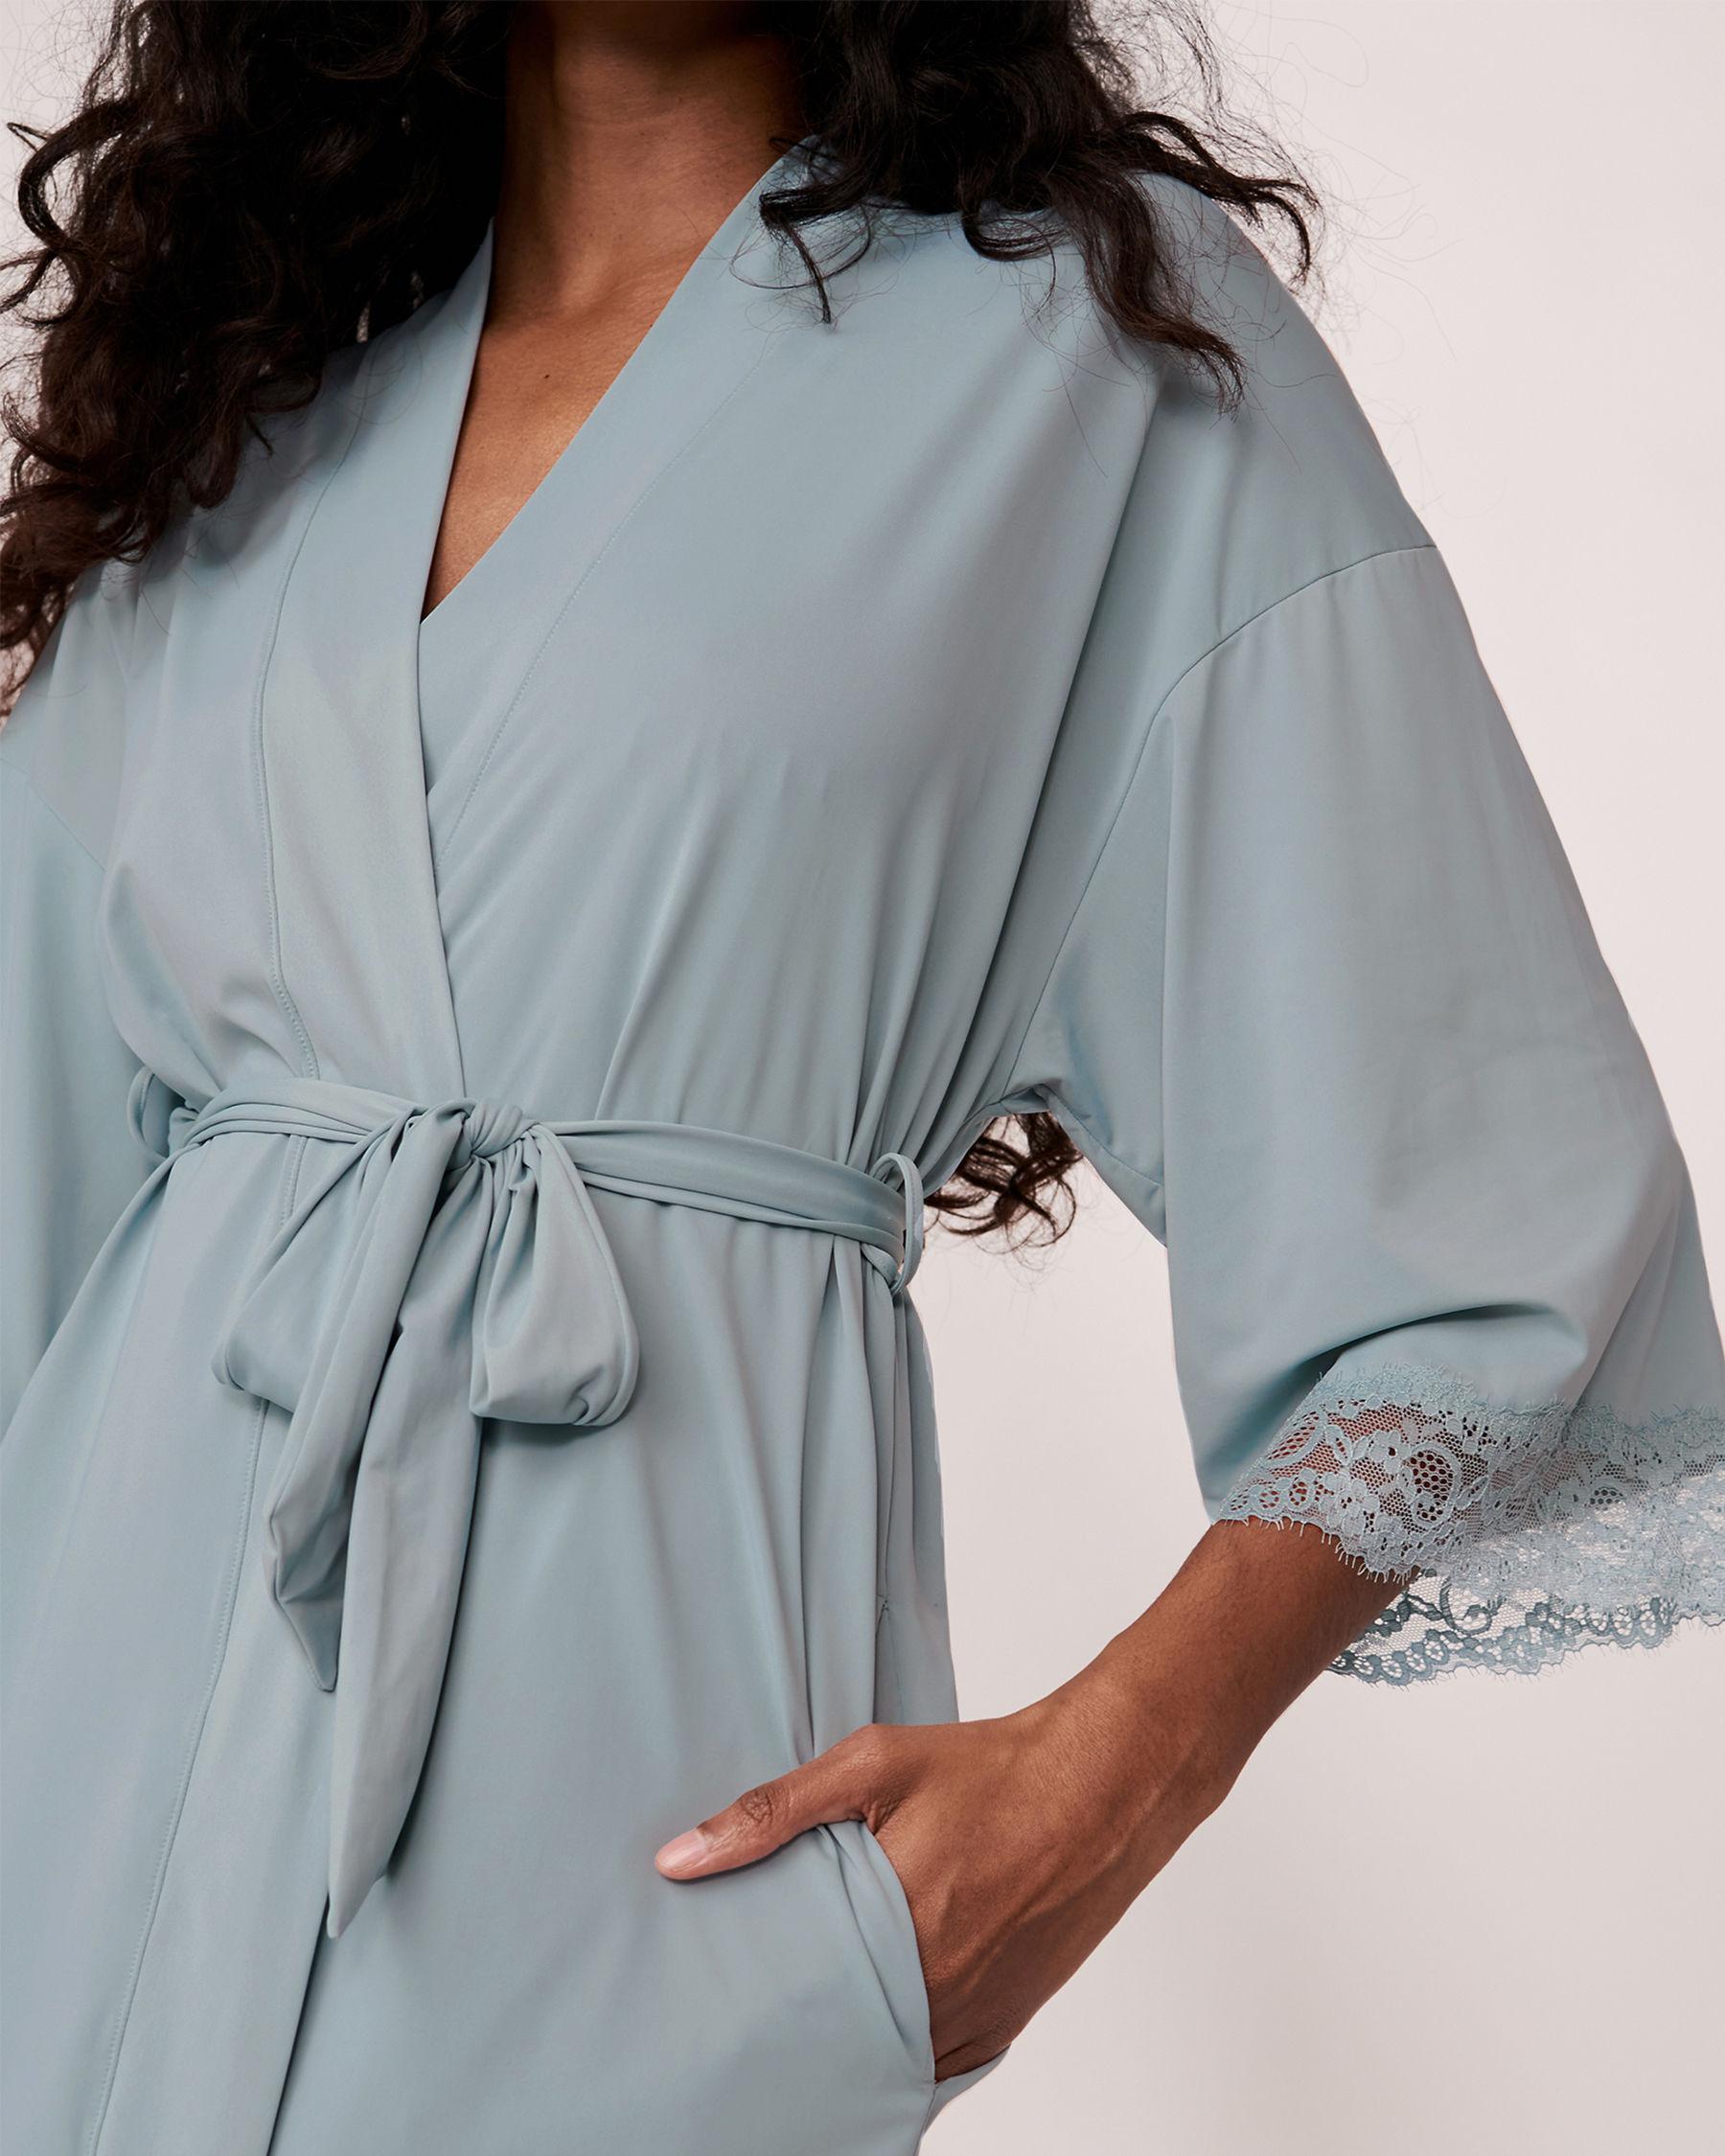 LA VIE EN ROSE Kimono garniture de dentelle Bleu gris 60600001 - Voir1